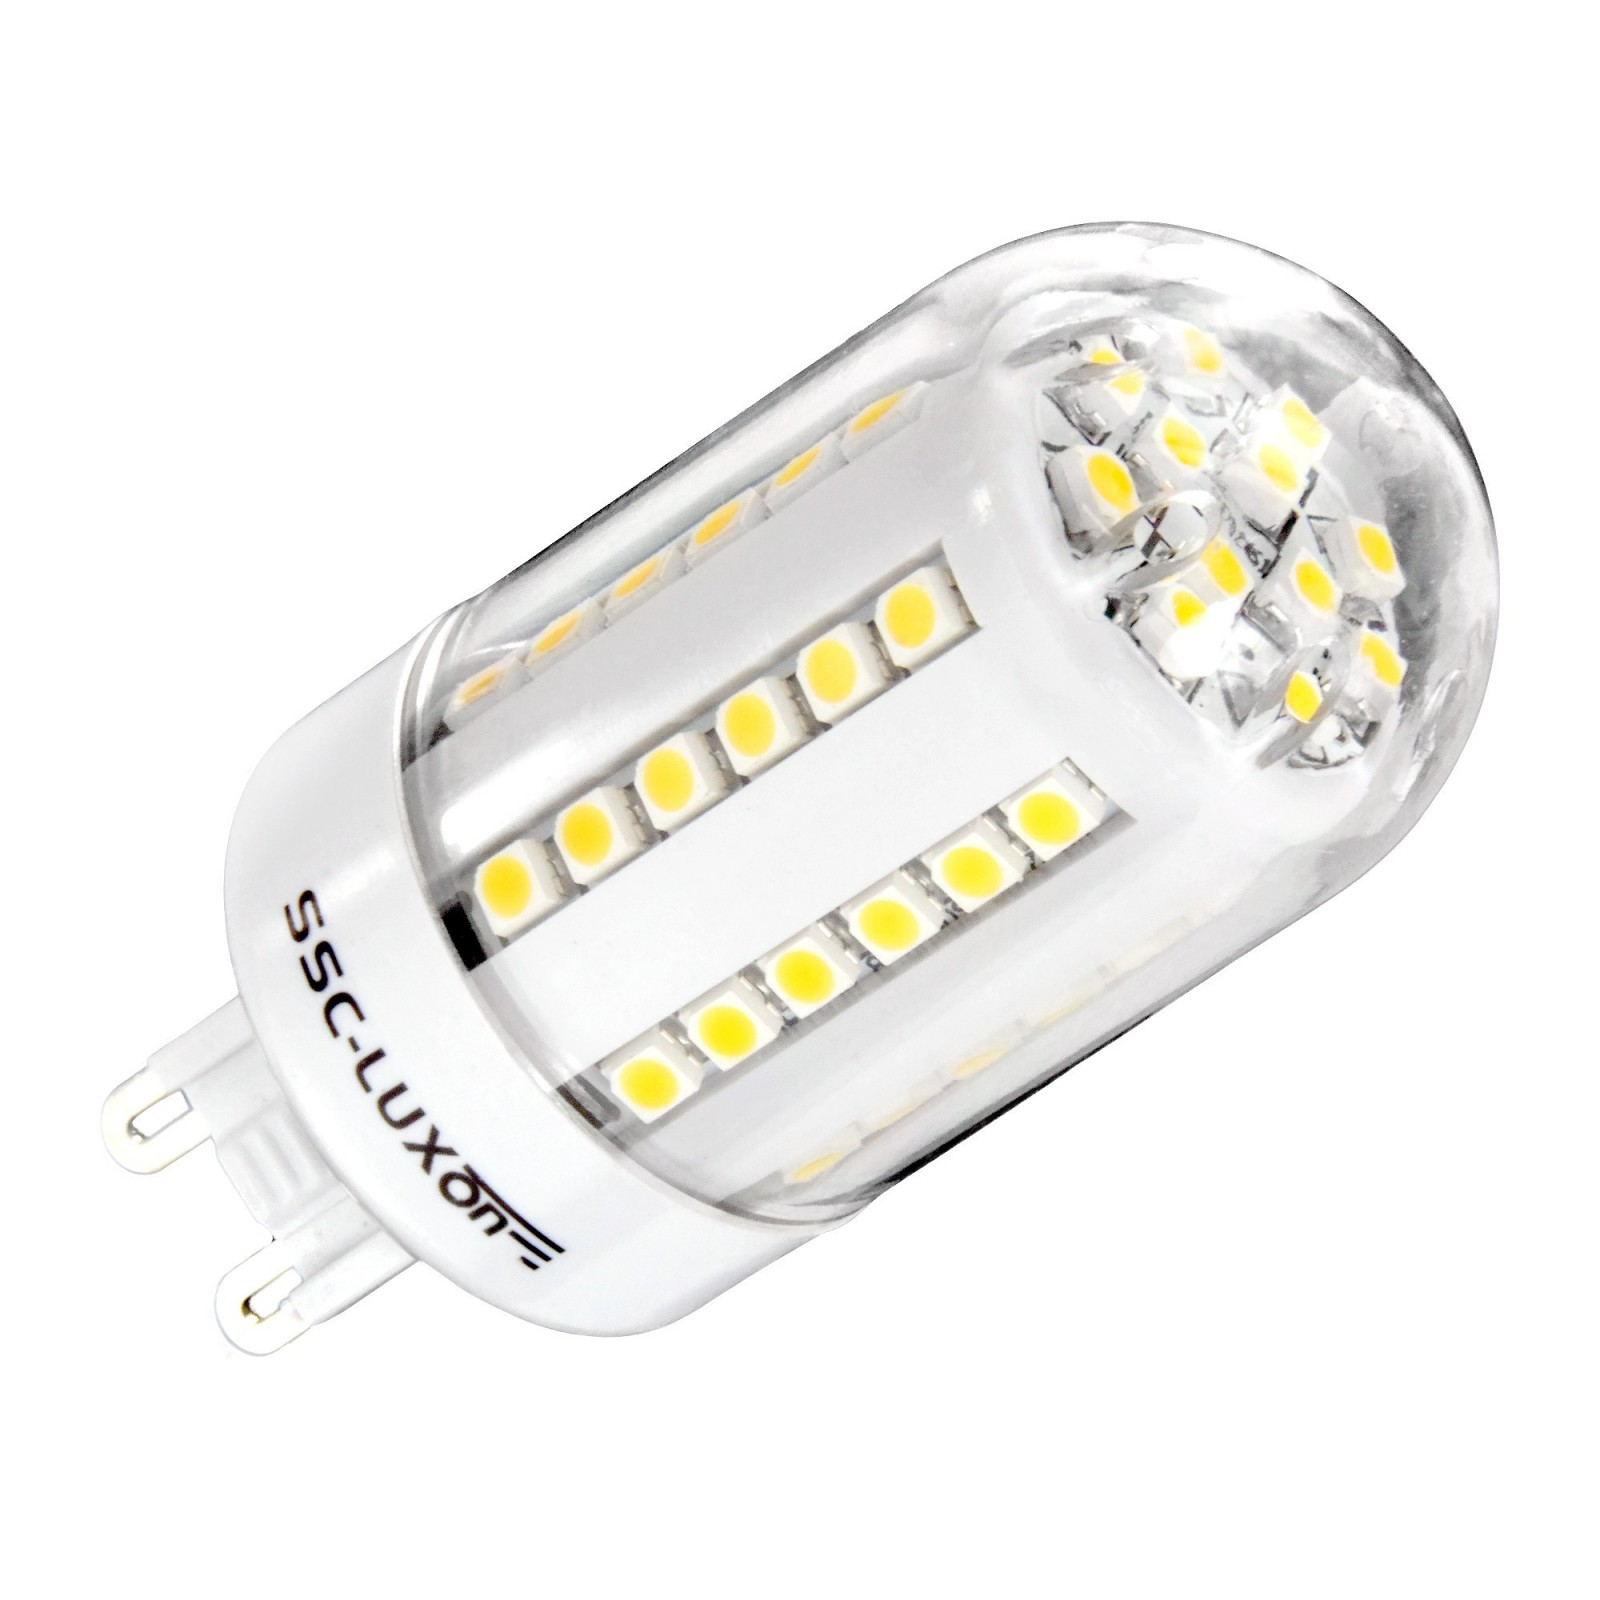 LED-Strahler mit 60 SMD LEDs, 3,5W, 230V, G9-Sockel, warm weiss, 180 ...